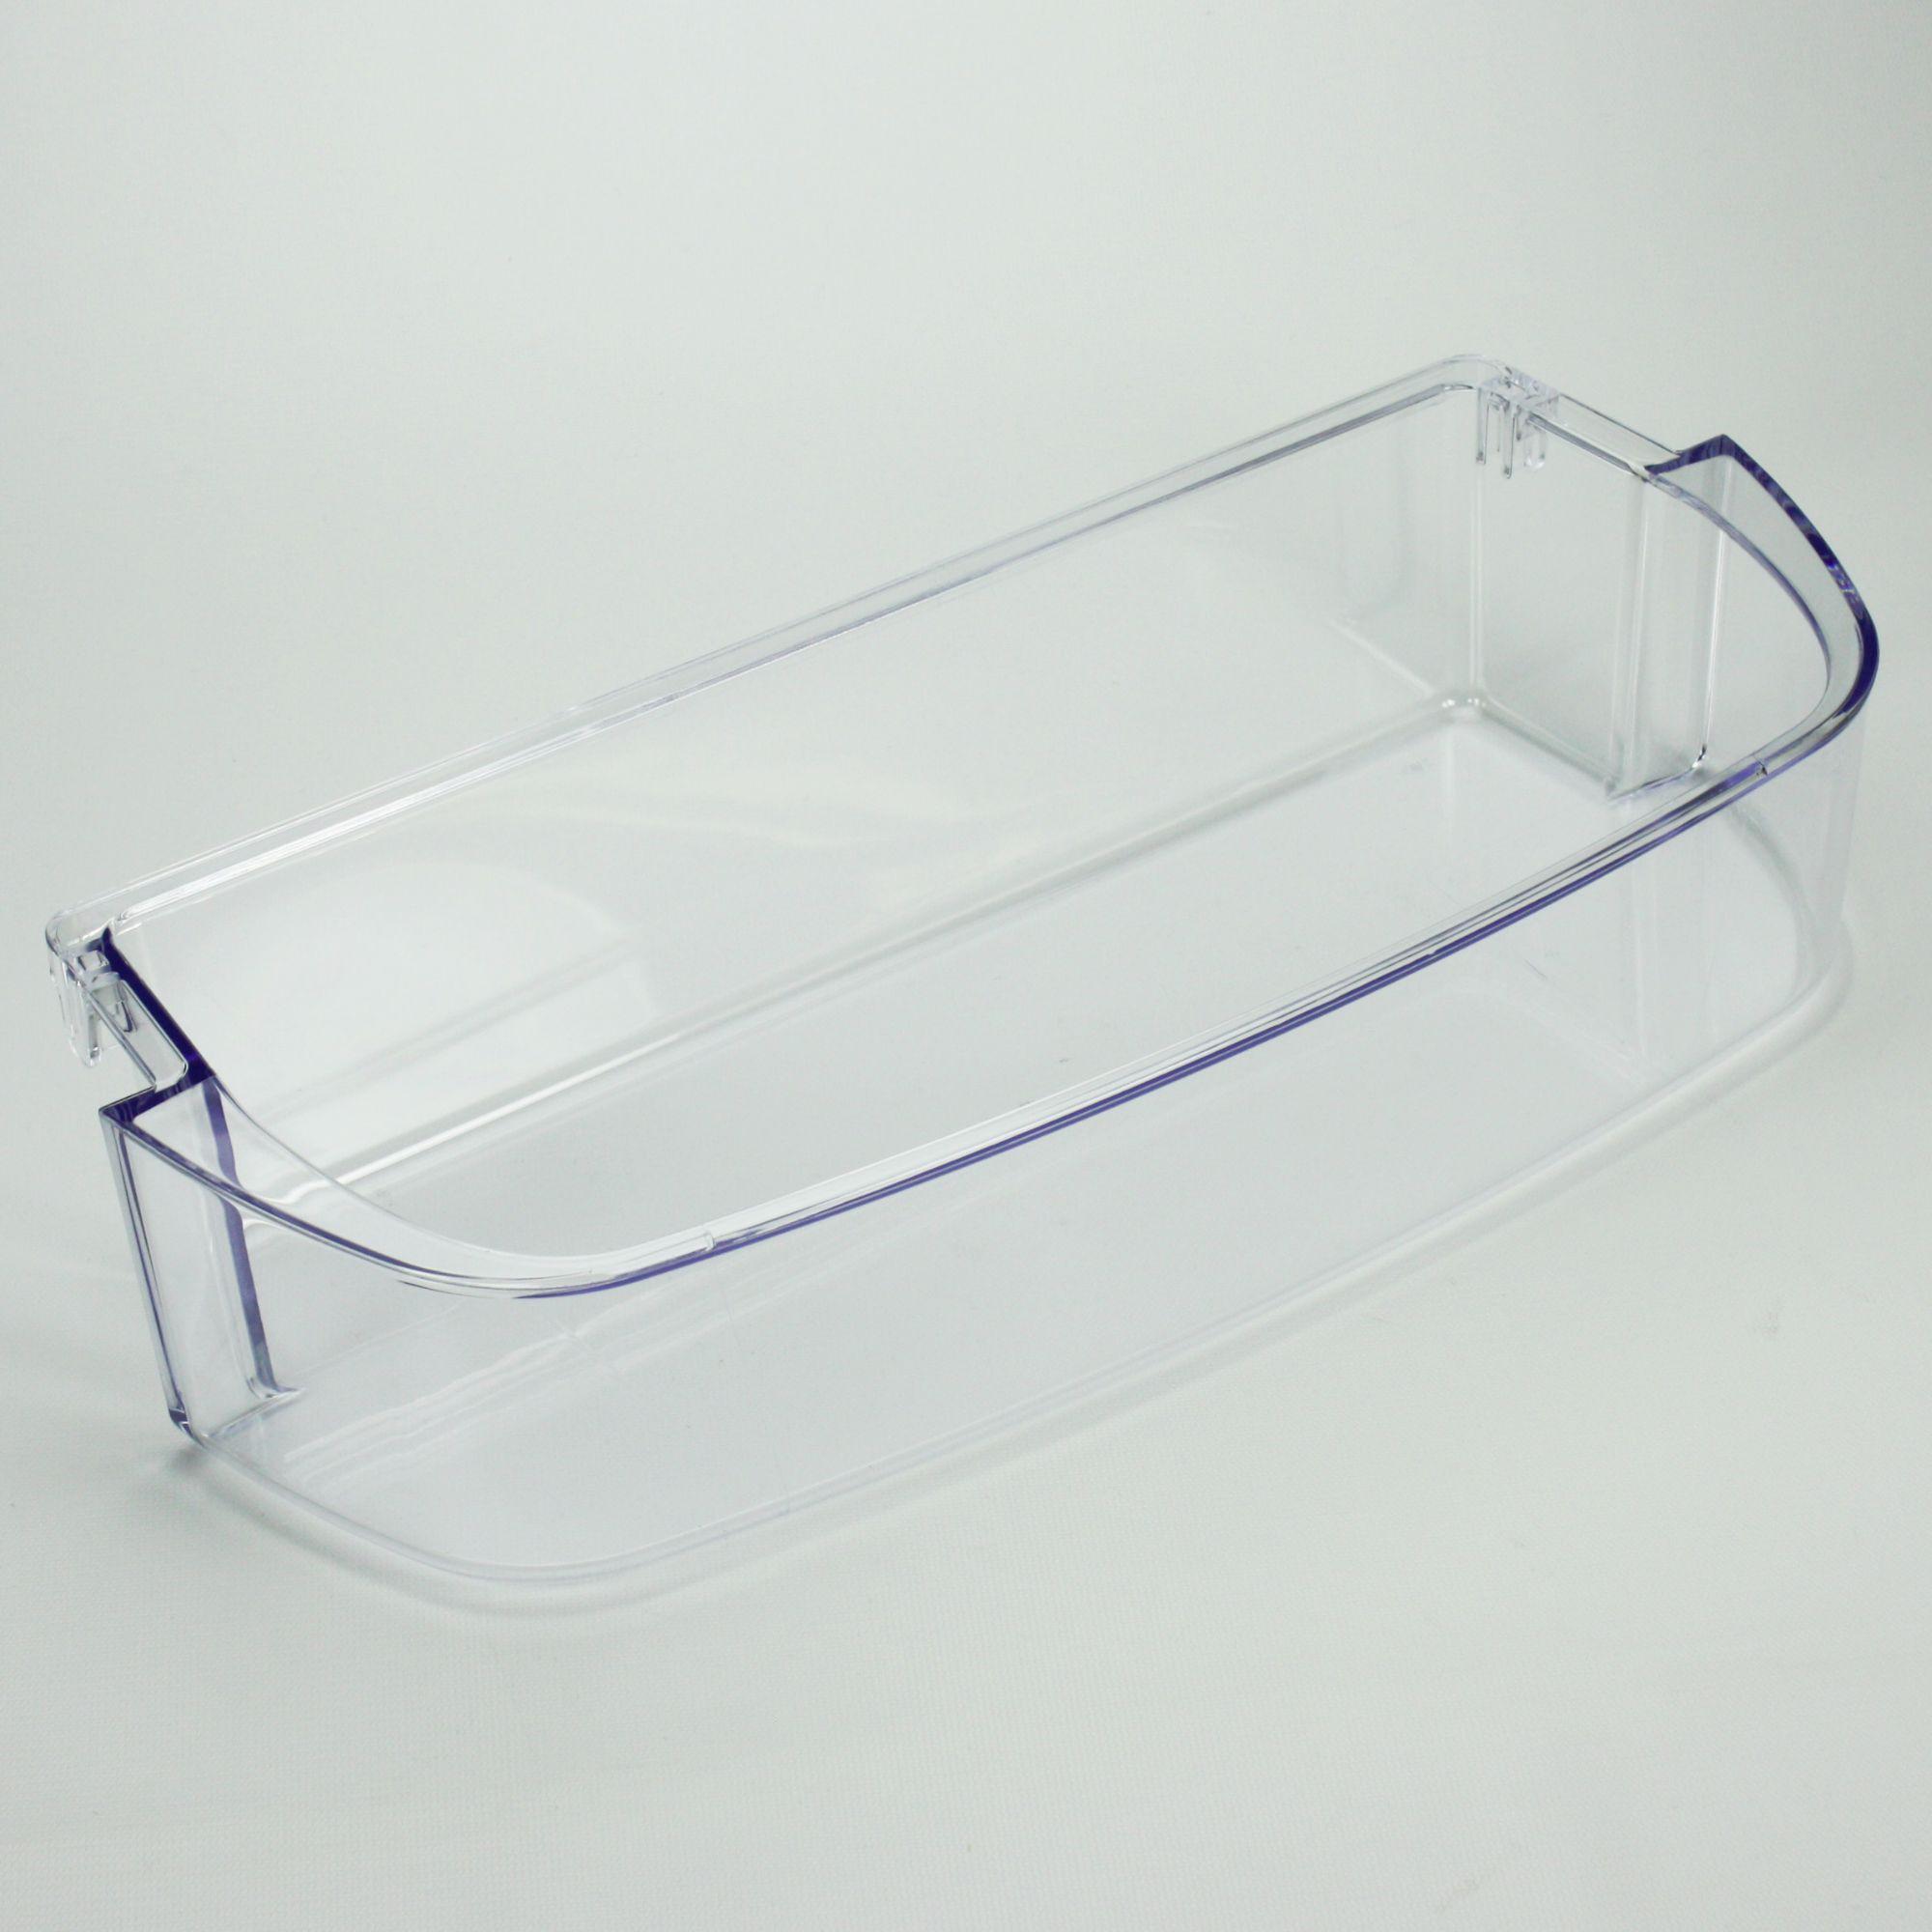 wpw10710203 for whirlpool refrigerator door shelf bin ebay. Black Bedroom Furniture Sets. Home Design Ideas